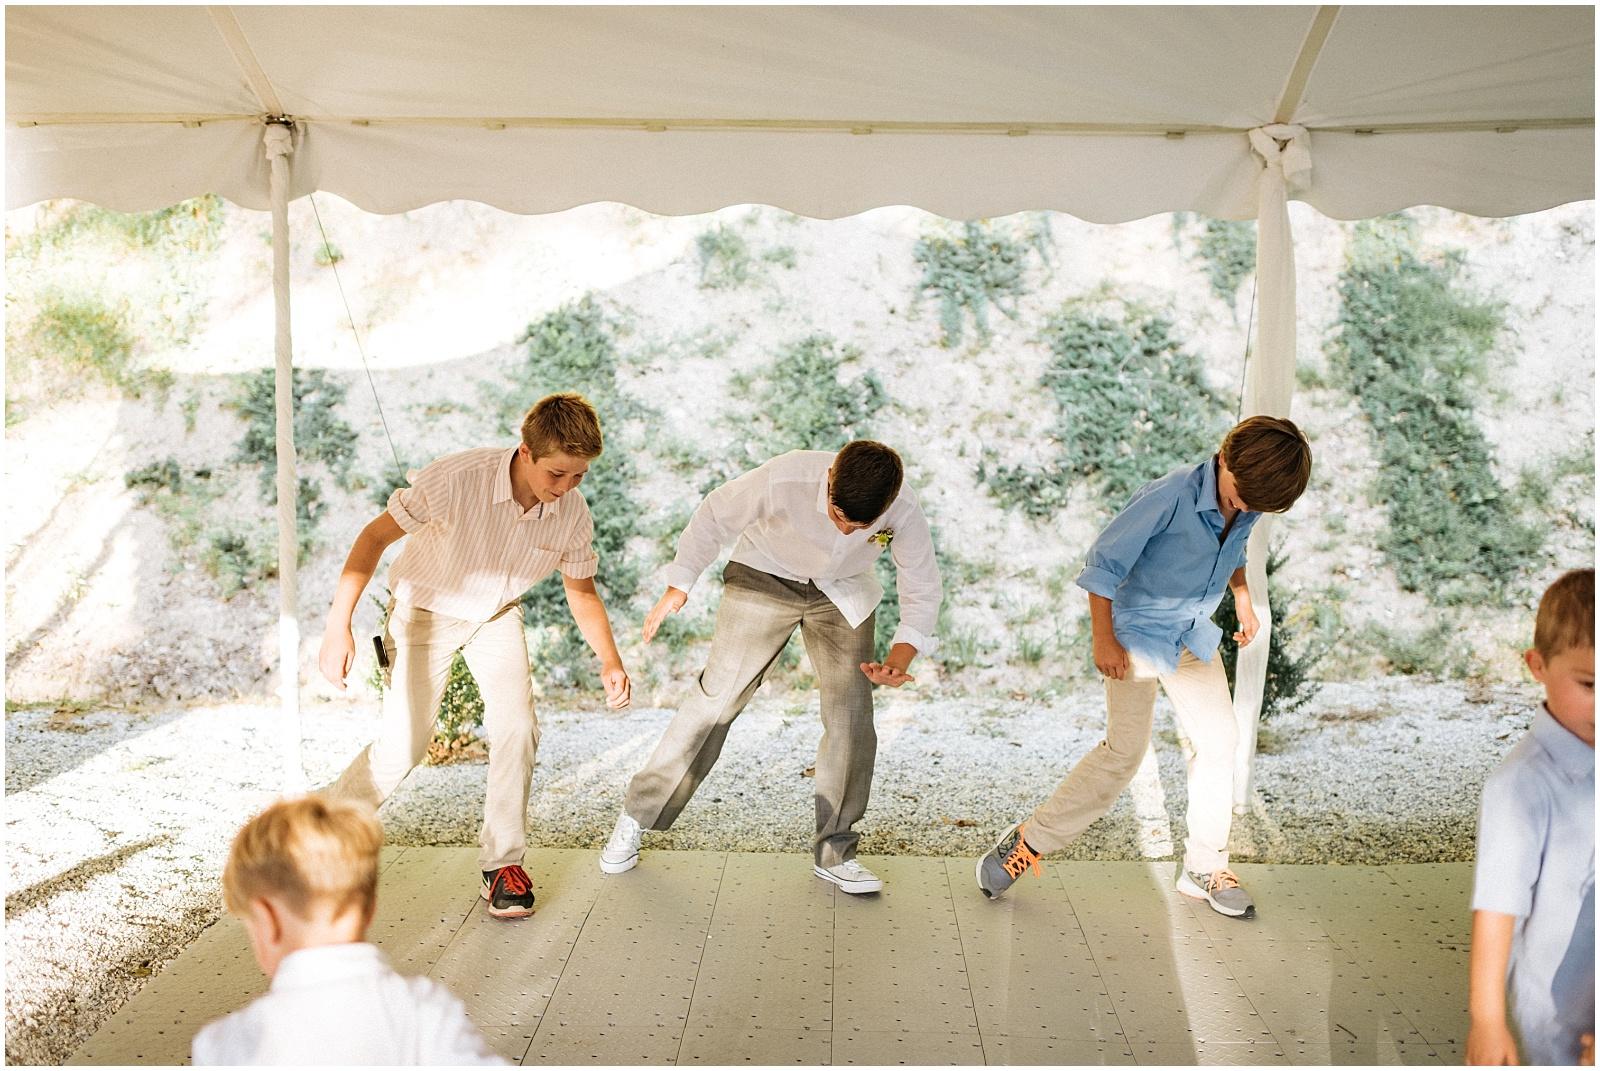 Ryan_Rechelle_Nantahalla_Weddings_Andrews_NC-149_Ryan_Rechelle_McGuire's_Millrace_Andrews_NC.jpg